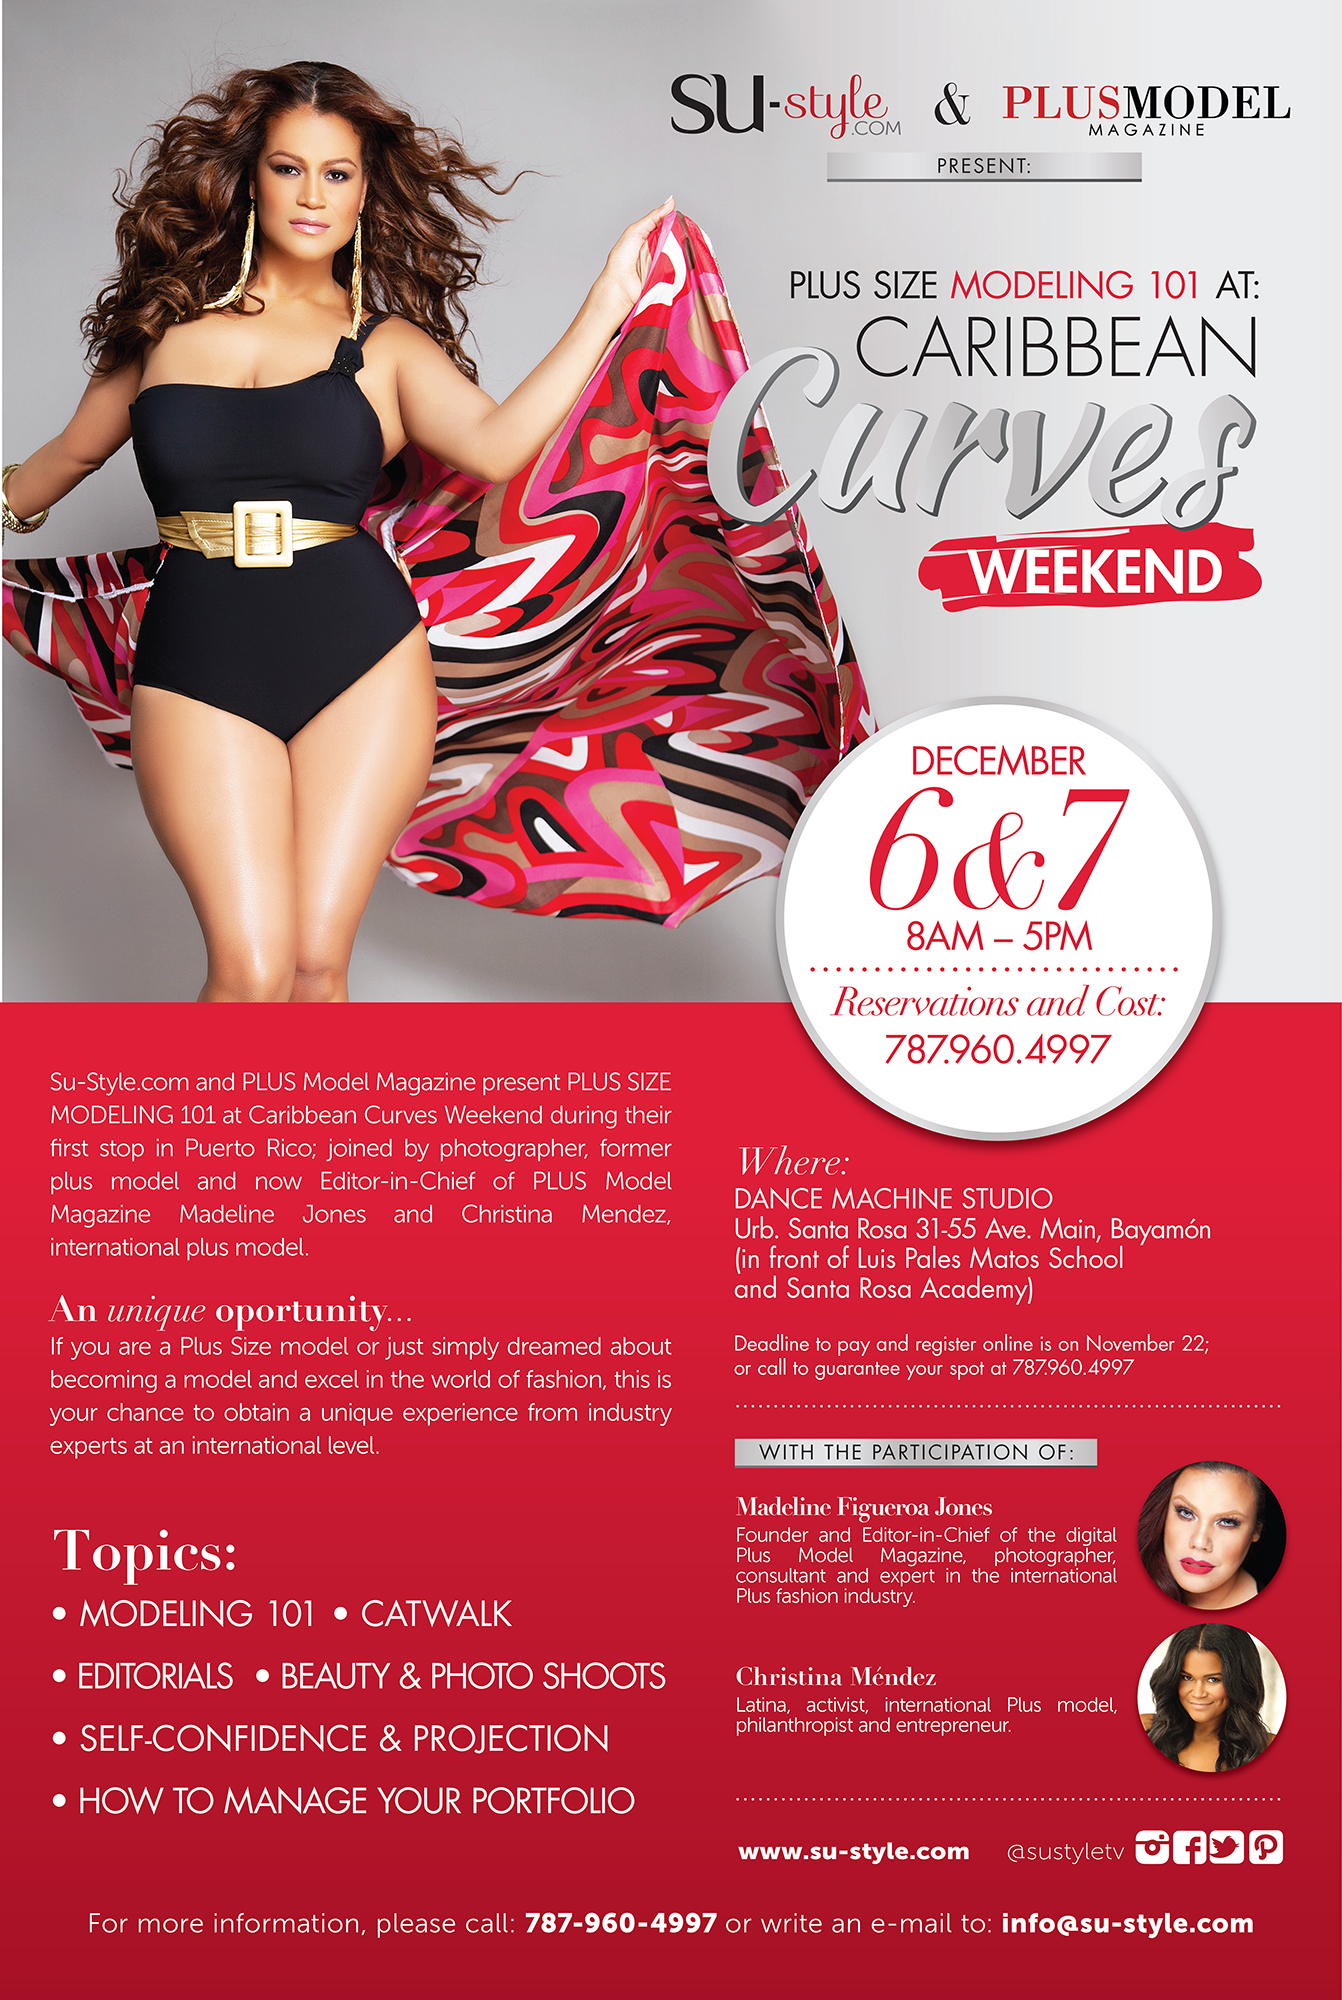 [EVENT] Plus Size Modeling Workshop En La Isla Del Encanto Puerto Rico